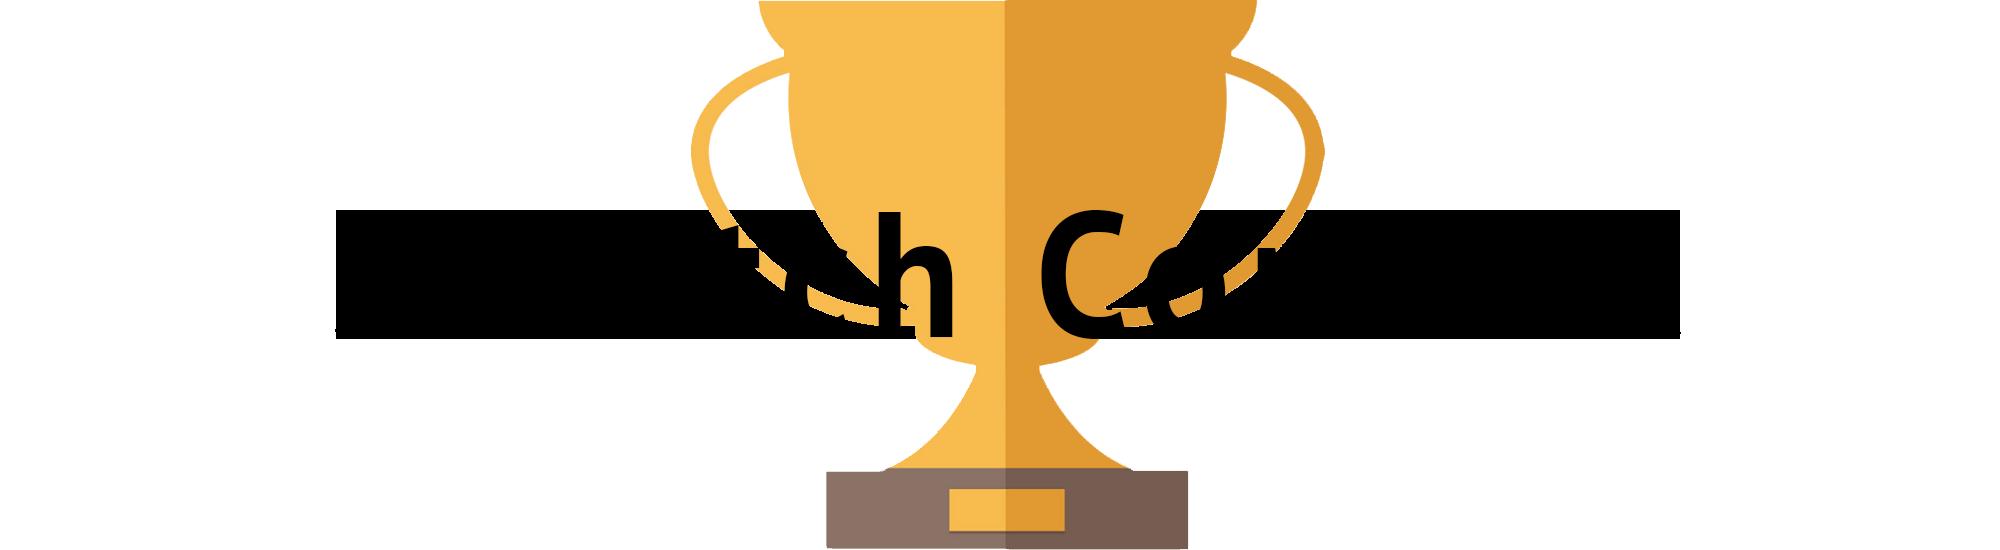 Scratch Contest